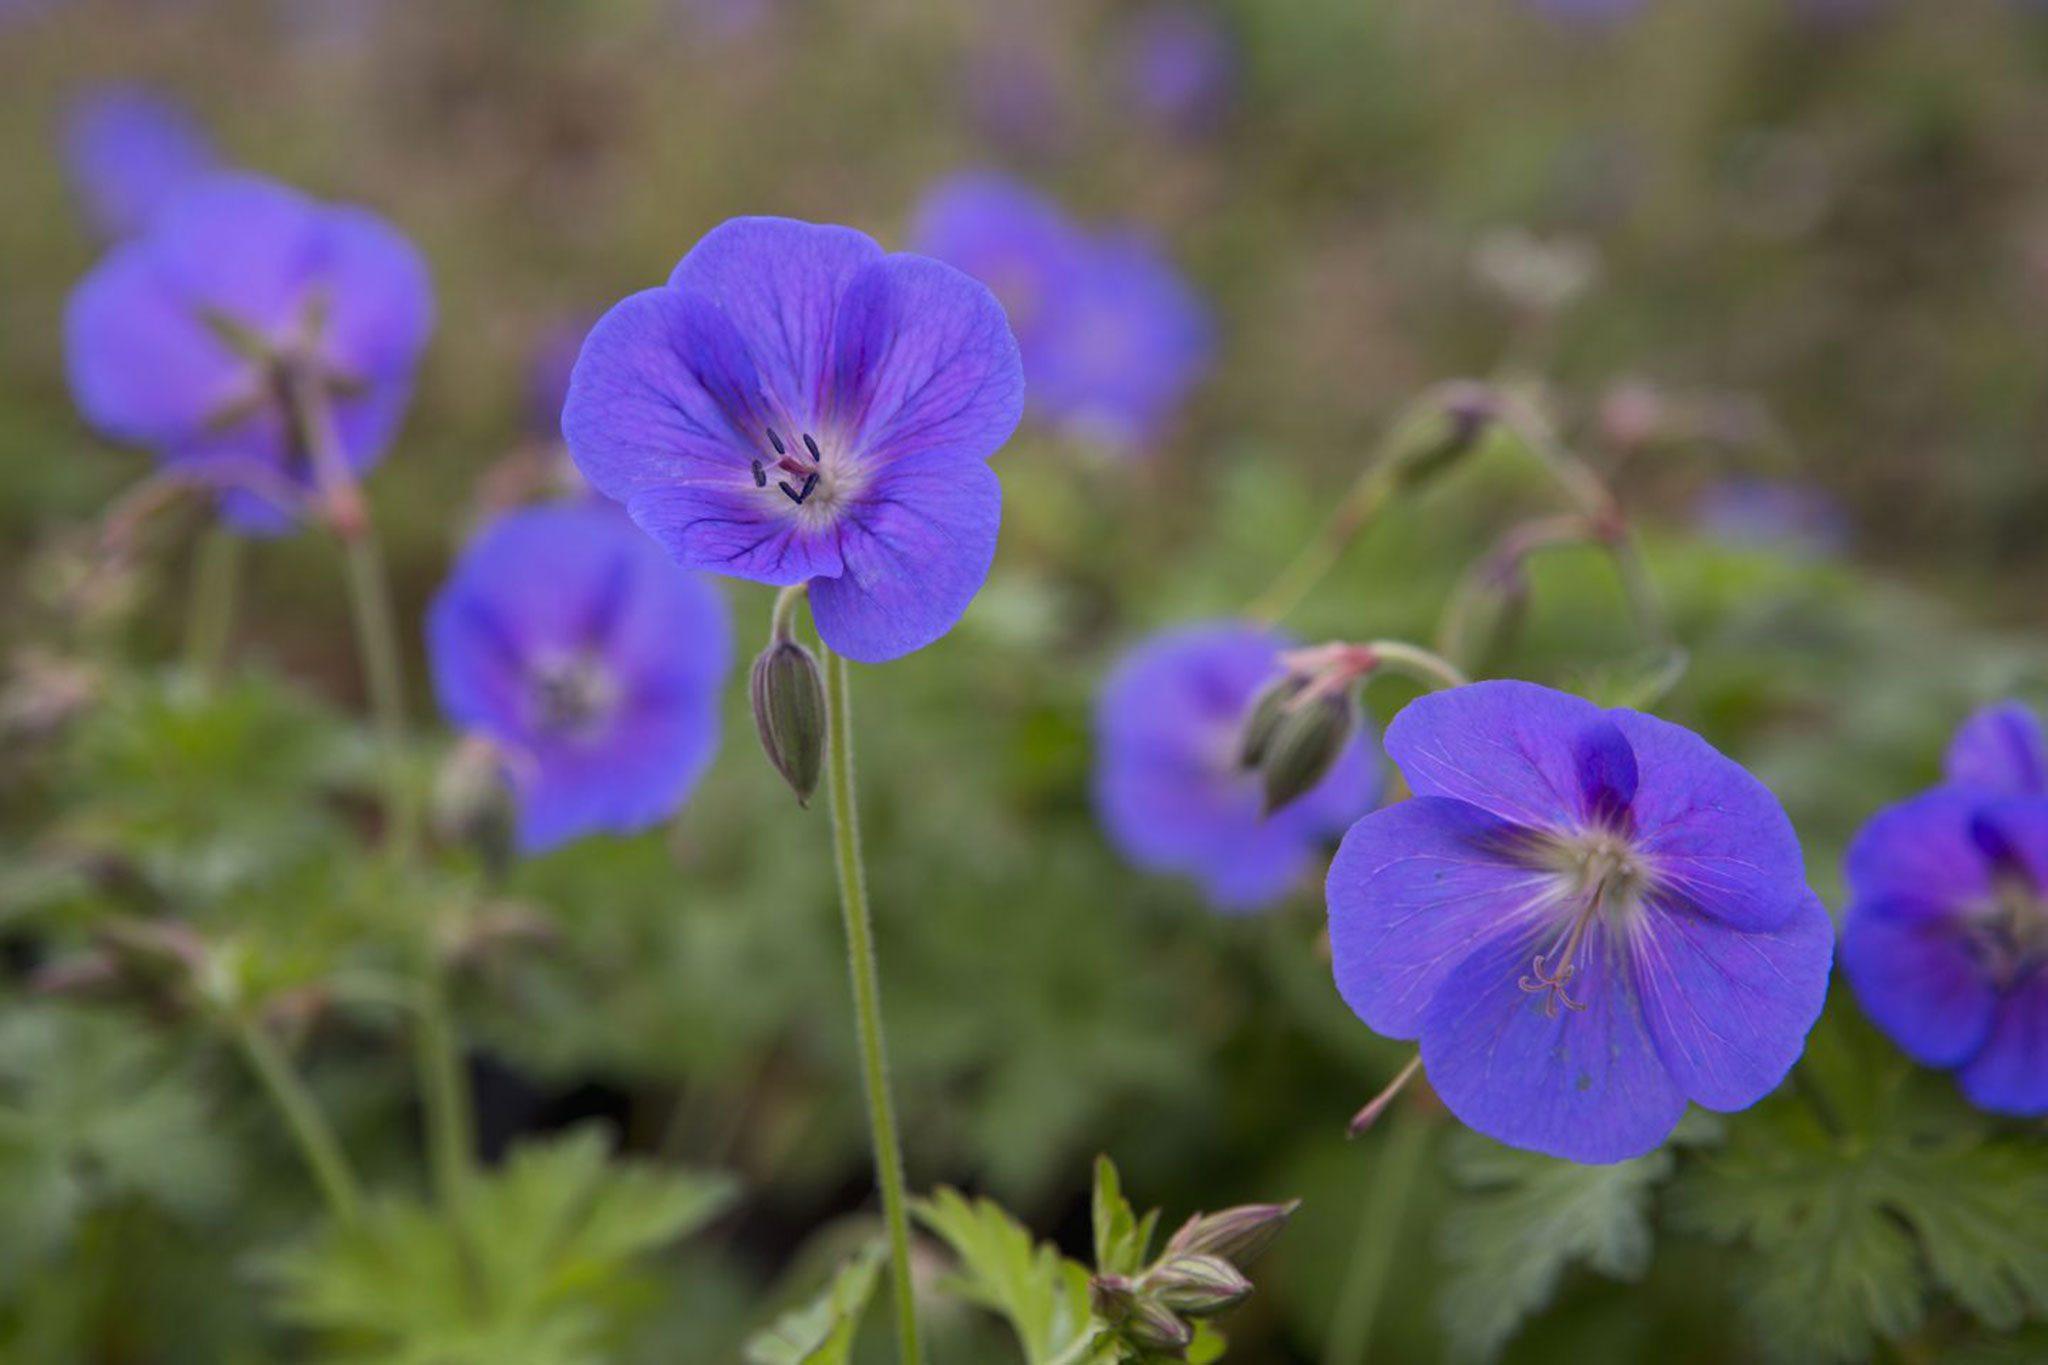 Geranium himalayense /'Gravetye/'